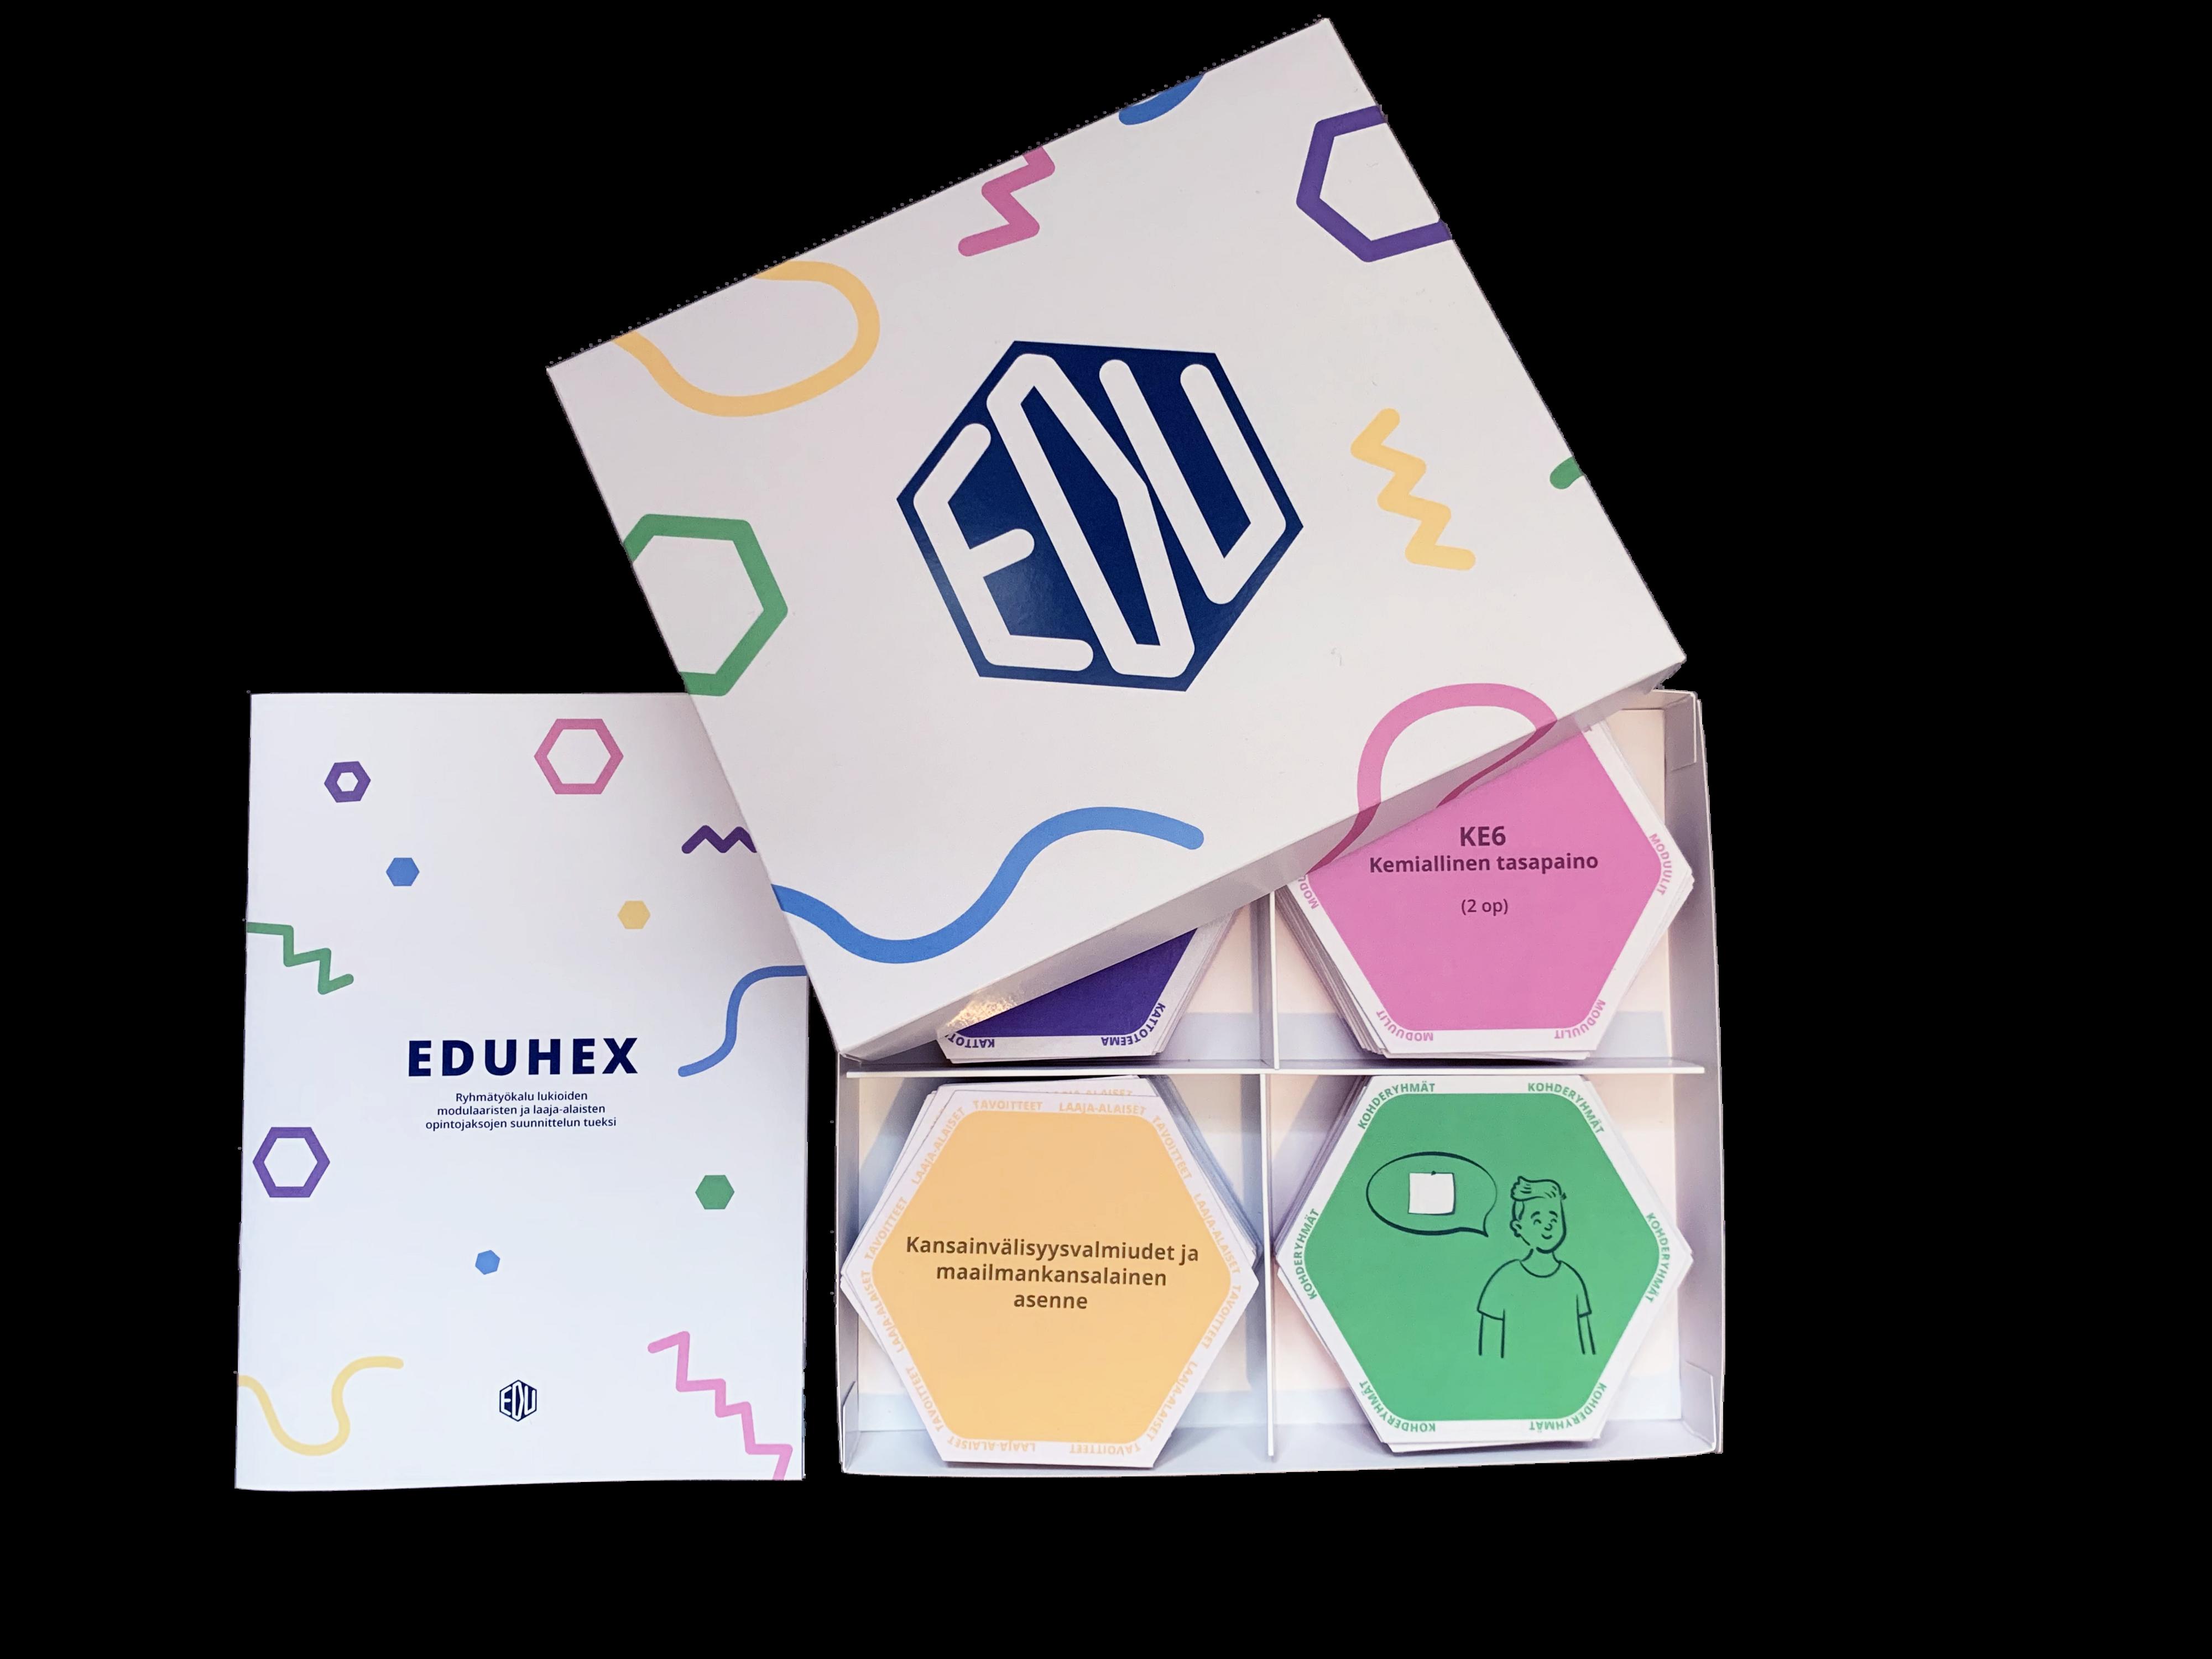 eduhex-peli copy